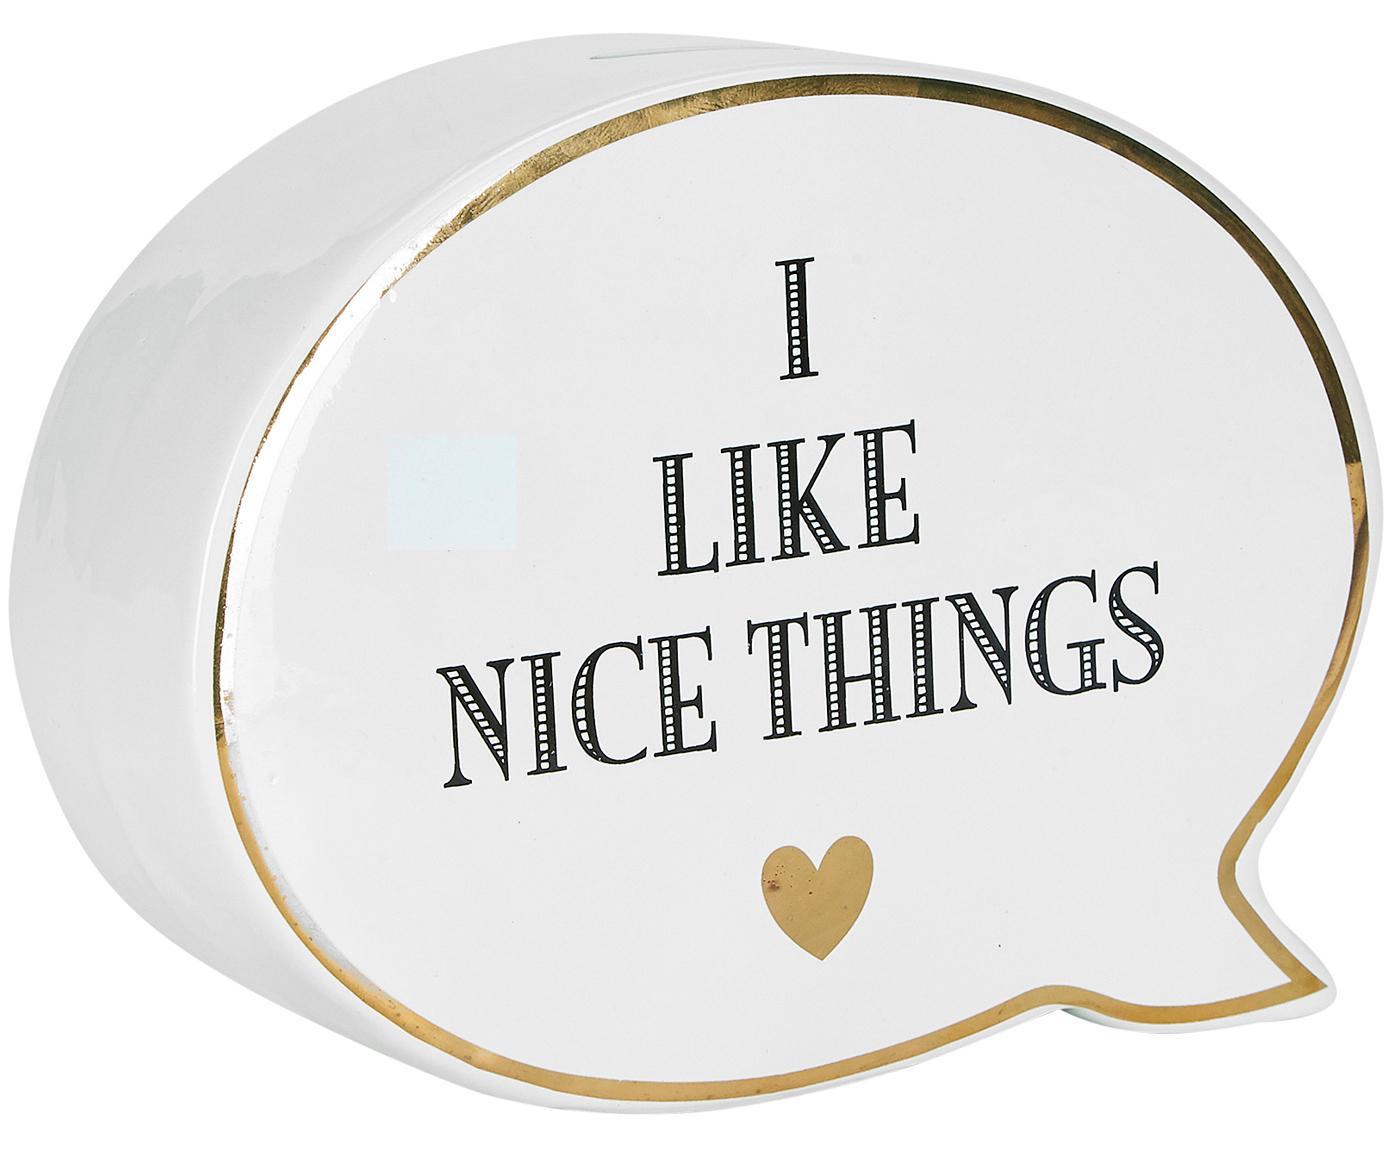 Spardose Nice Things, Keramik, Weiss, Schwarz, 18 x 14 cm